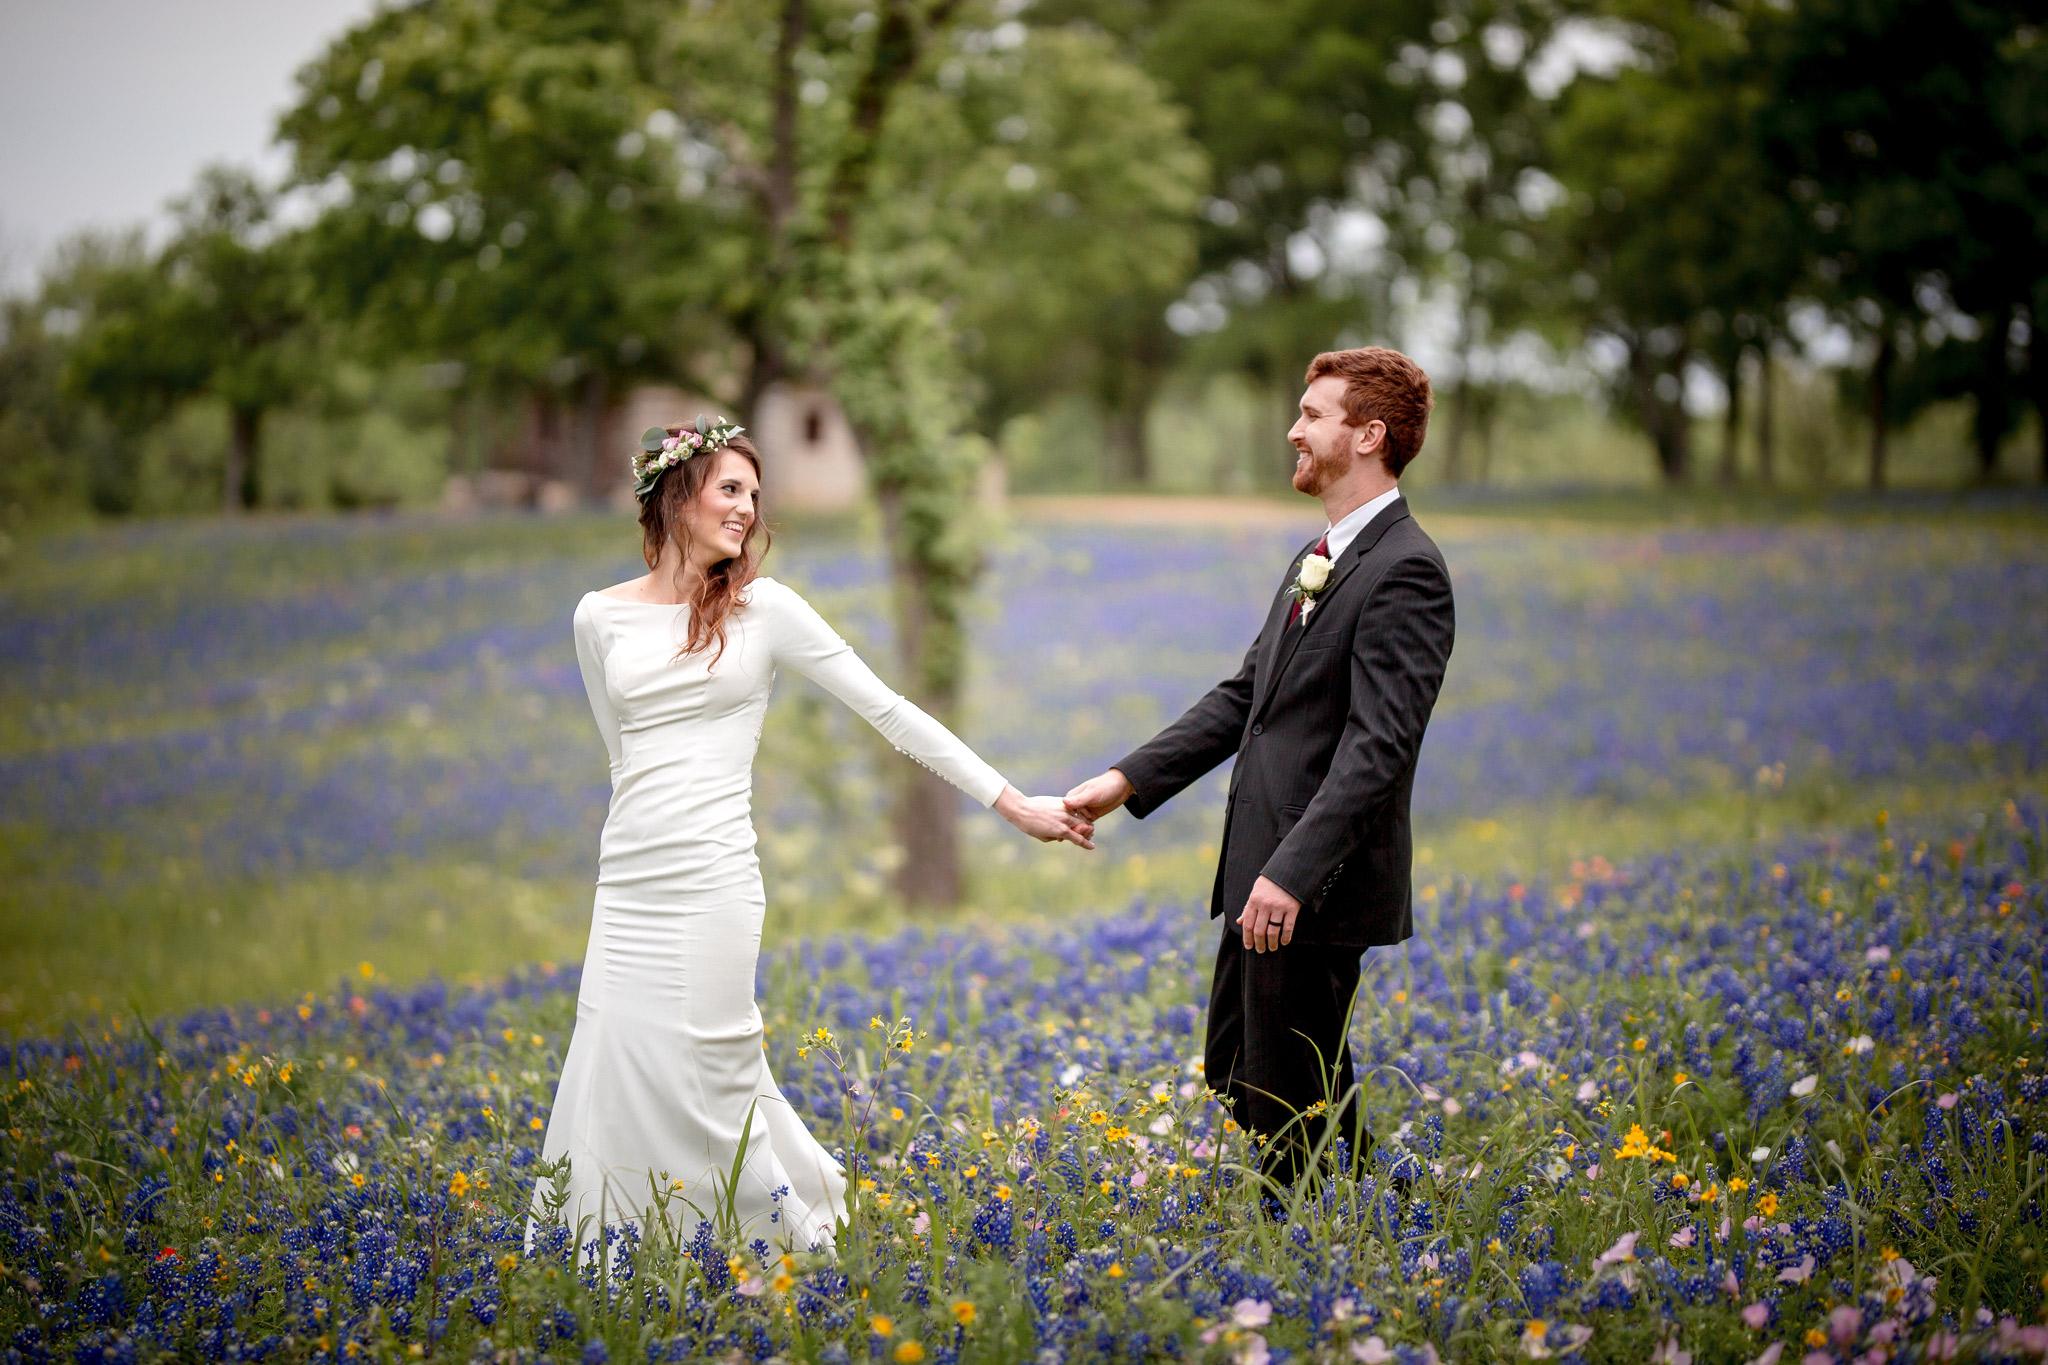 GaryBlakePhoto_Starhill_Wedding_156.jpg